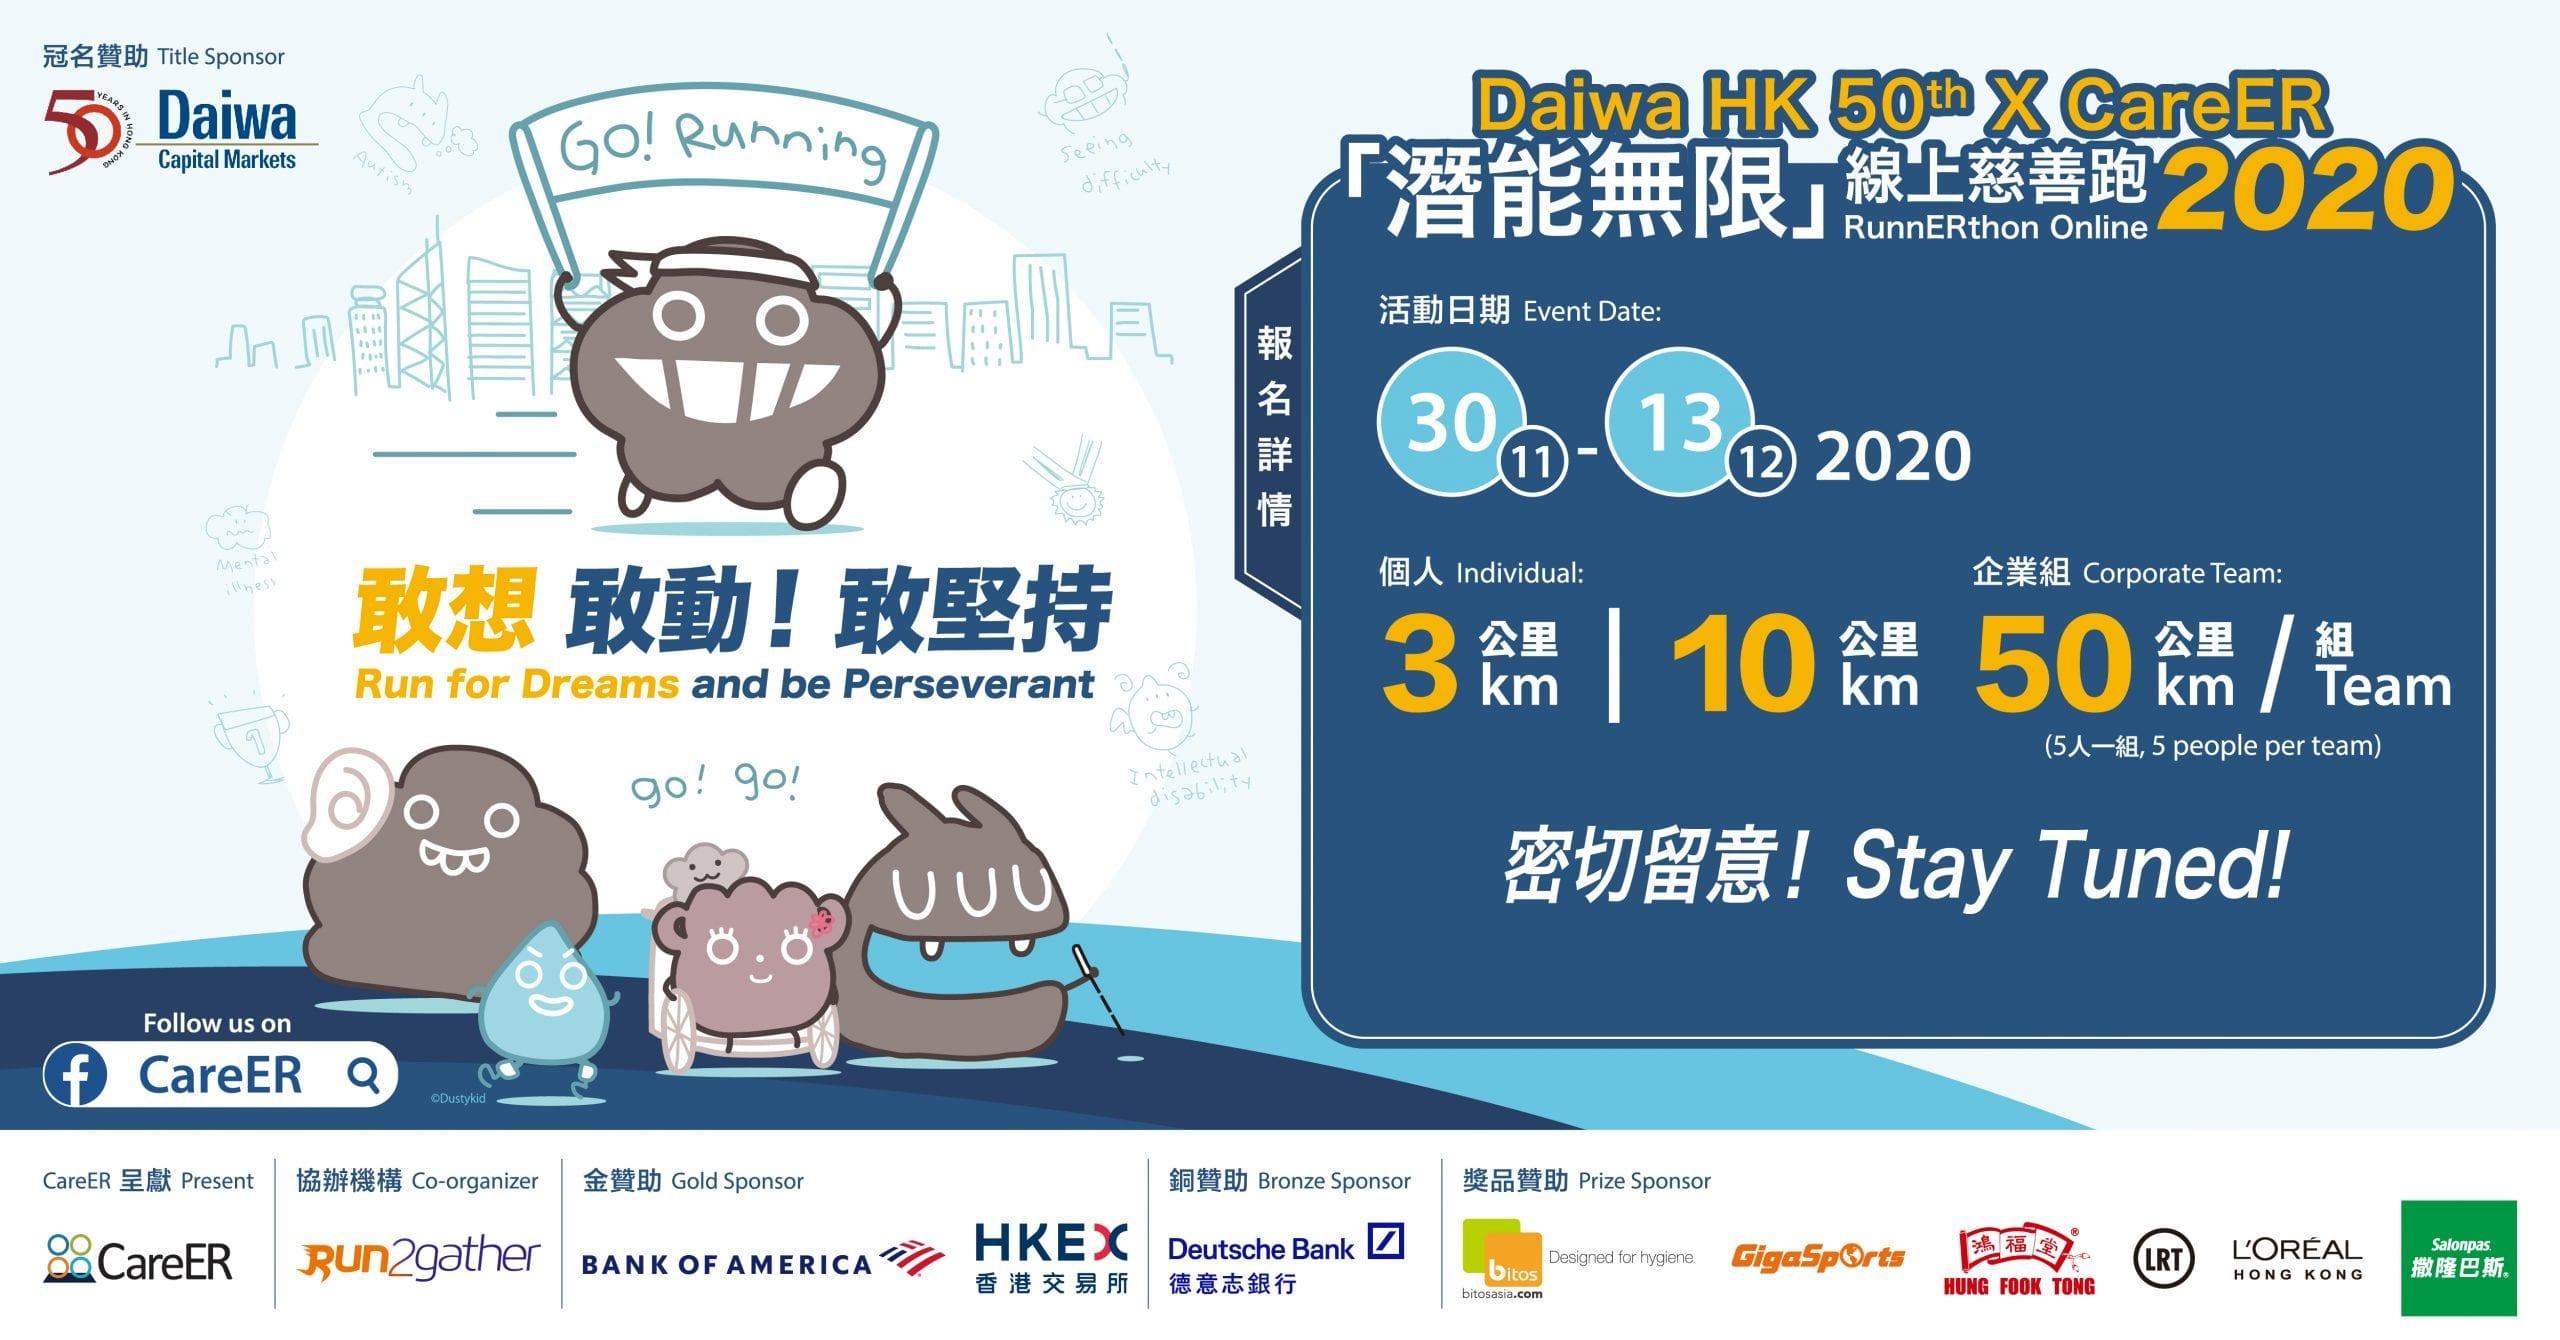 大和香港50th X CareER潛能無限線上慈善跑2020 Daiwa HK 50th X CareER RunnERthon Online 2020